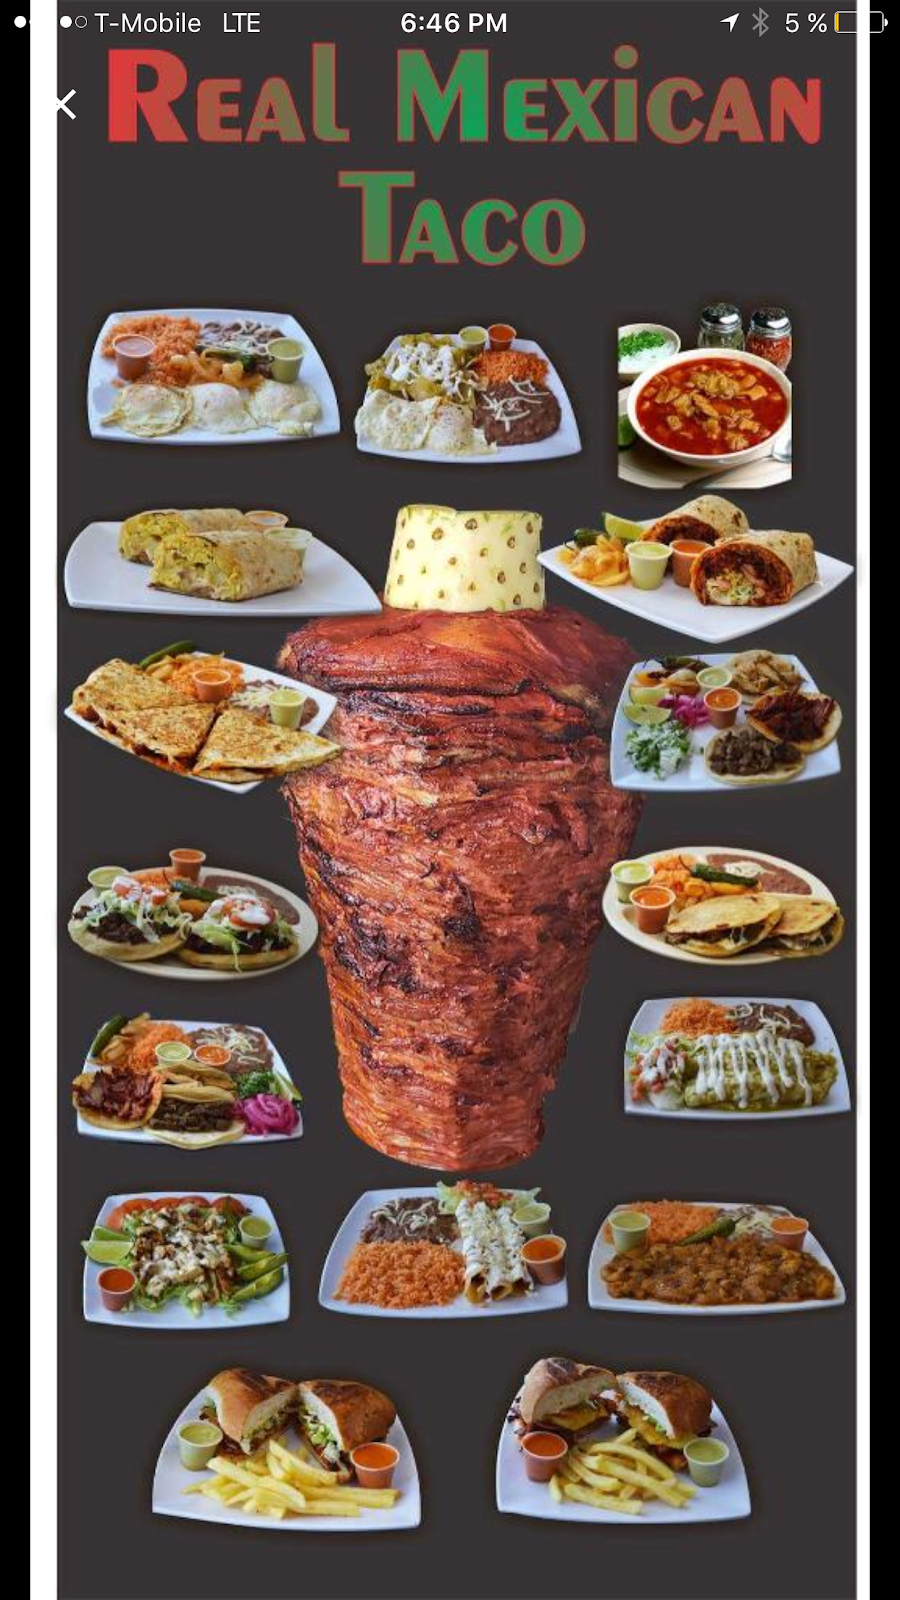 La Auténtica Taqueria   restaurant   220 E Moore Ave, Terrell, TX 75160, USA   9722107290 OR +1 972-210-7290